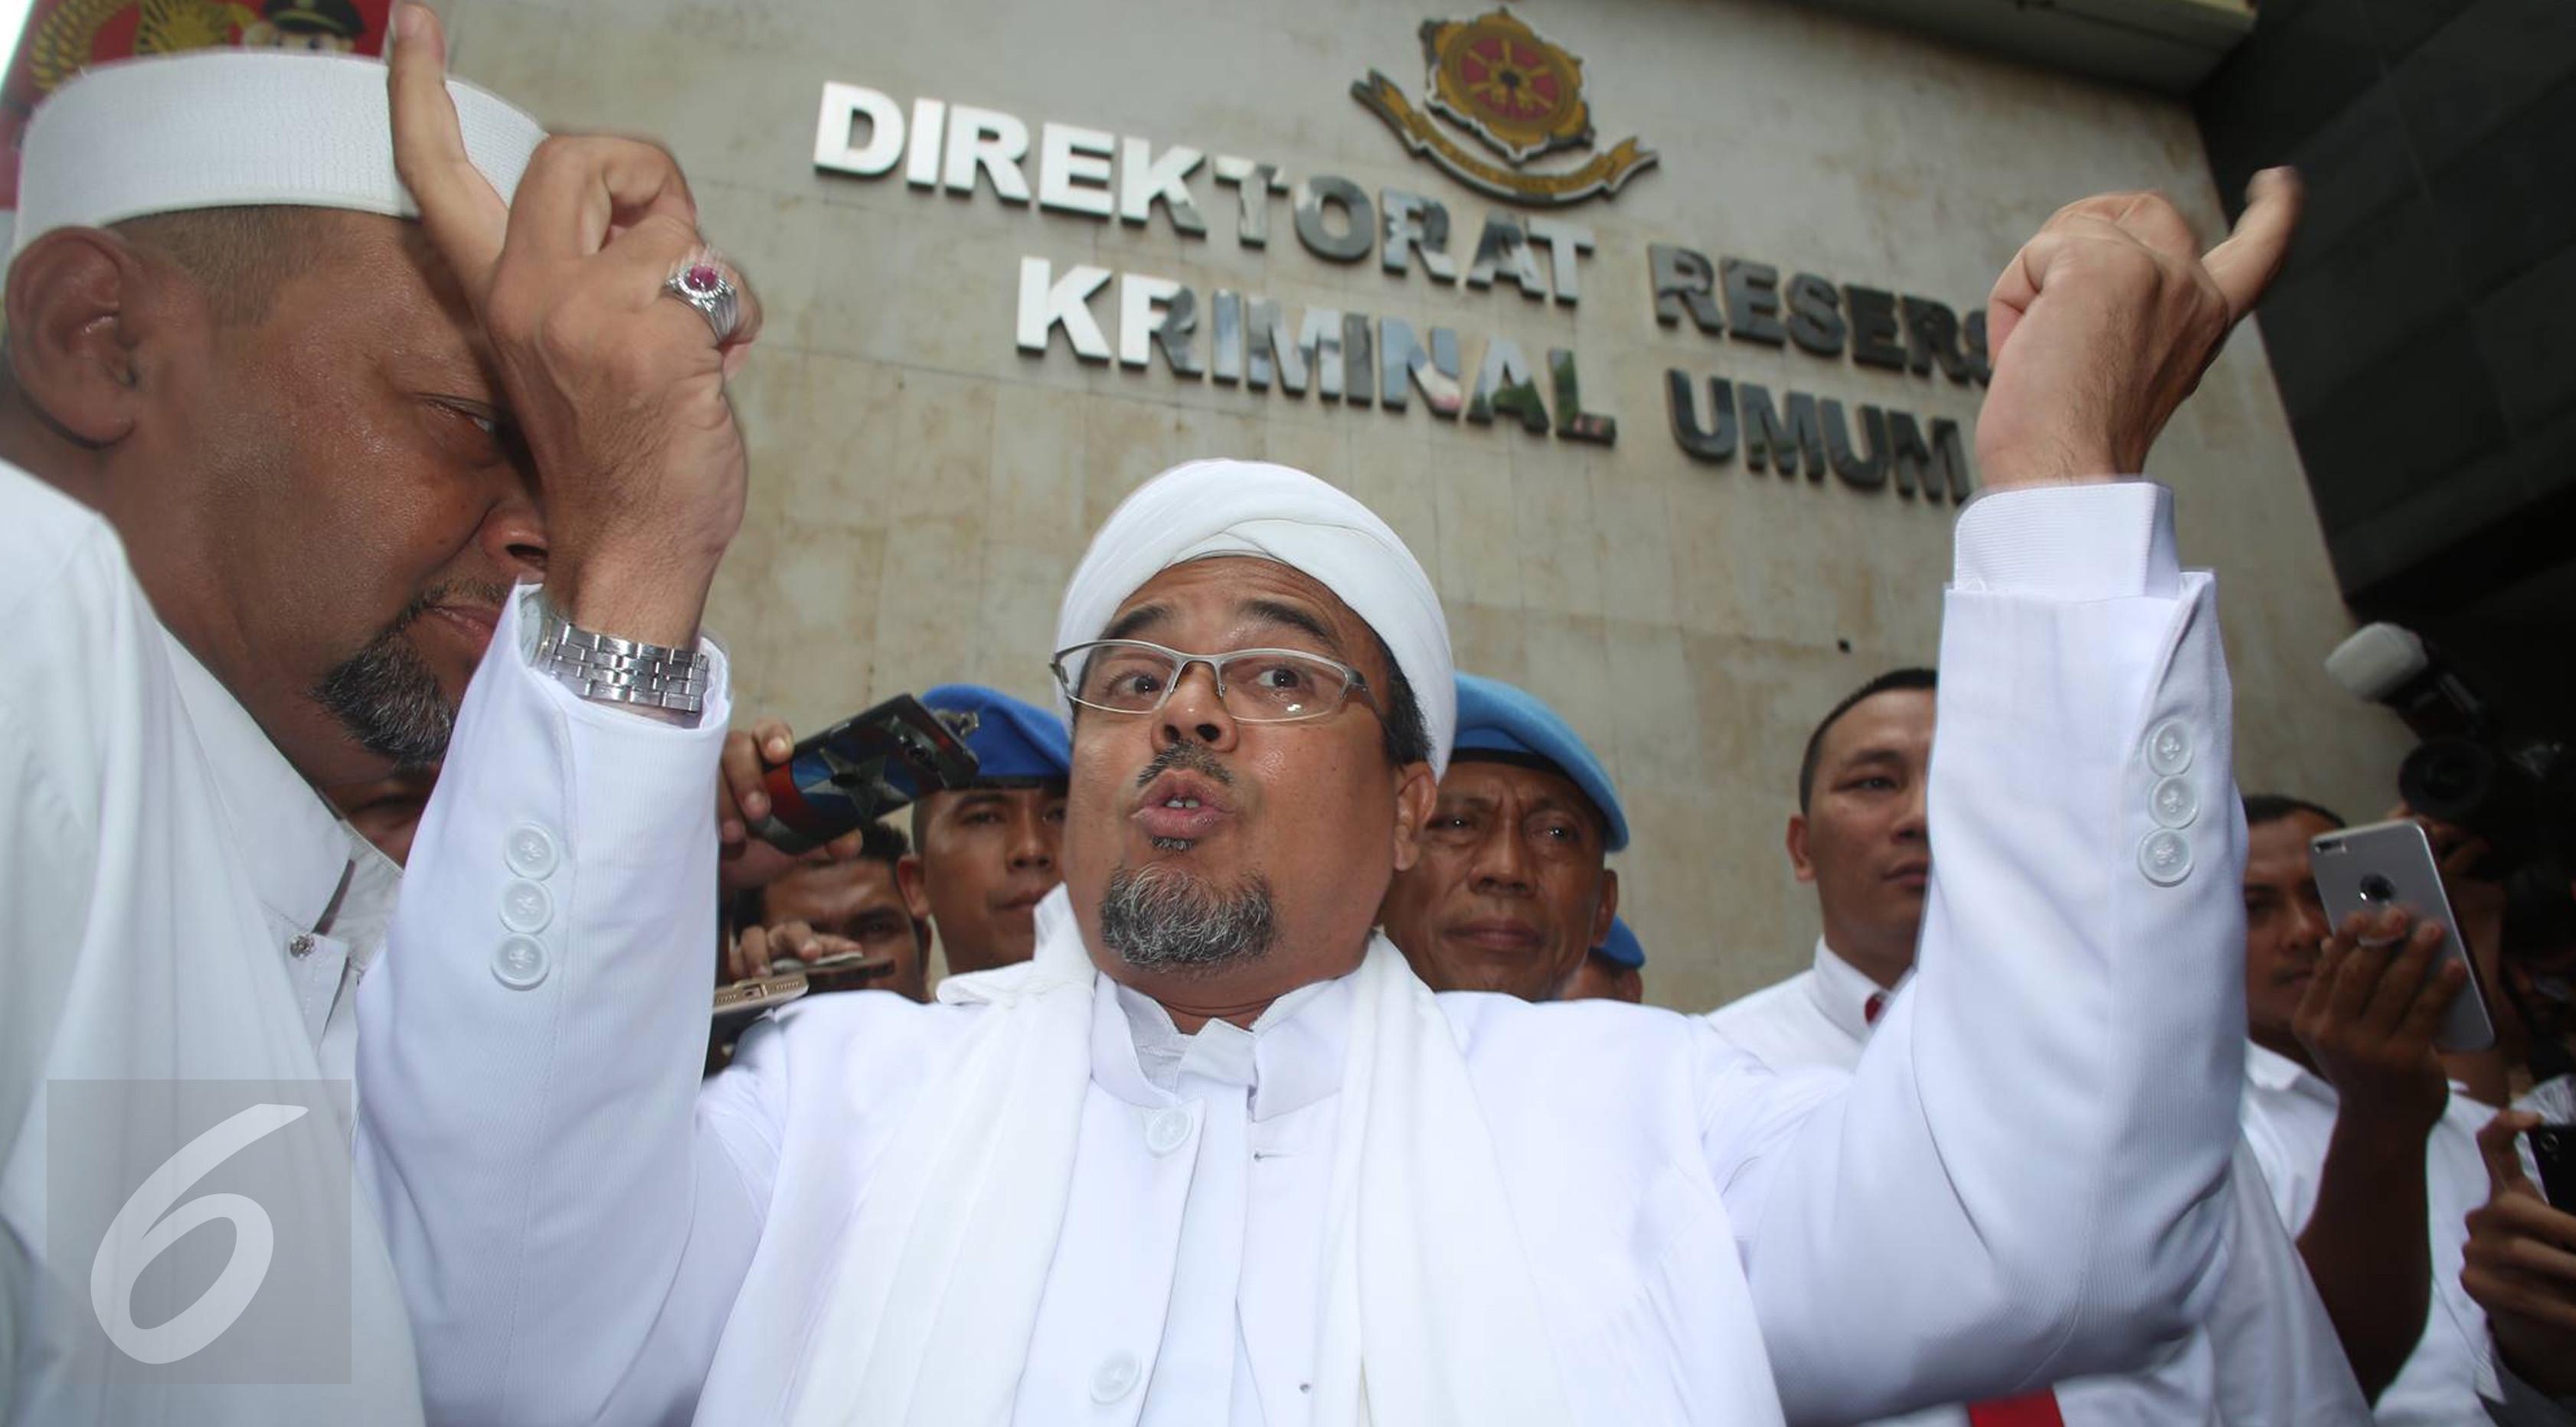 Pimpinan Front Pembela Islam (FPI) Rizieq Shihab tiba di Polda Metro Jaya, Jakarta, untuk diperiksa sebagai saksi kasus dugaan makar, Rabu (1/2). (Liputan6.com/Immanuel Antonius)